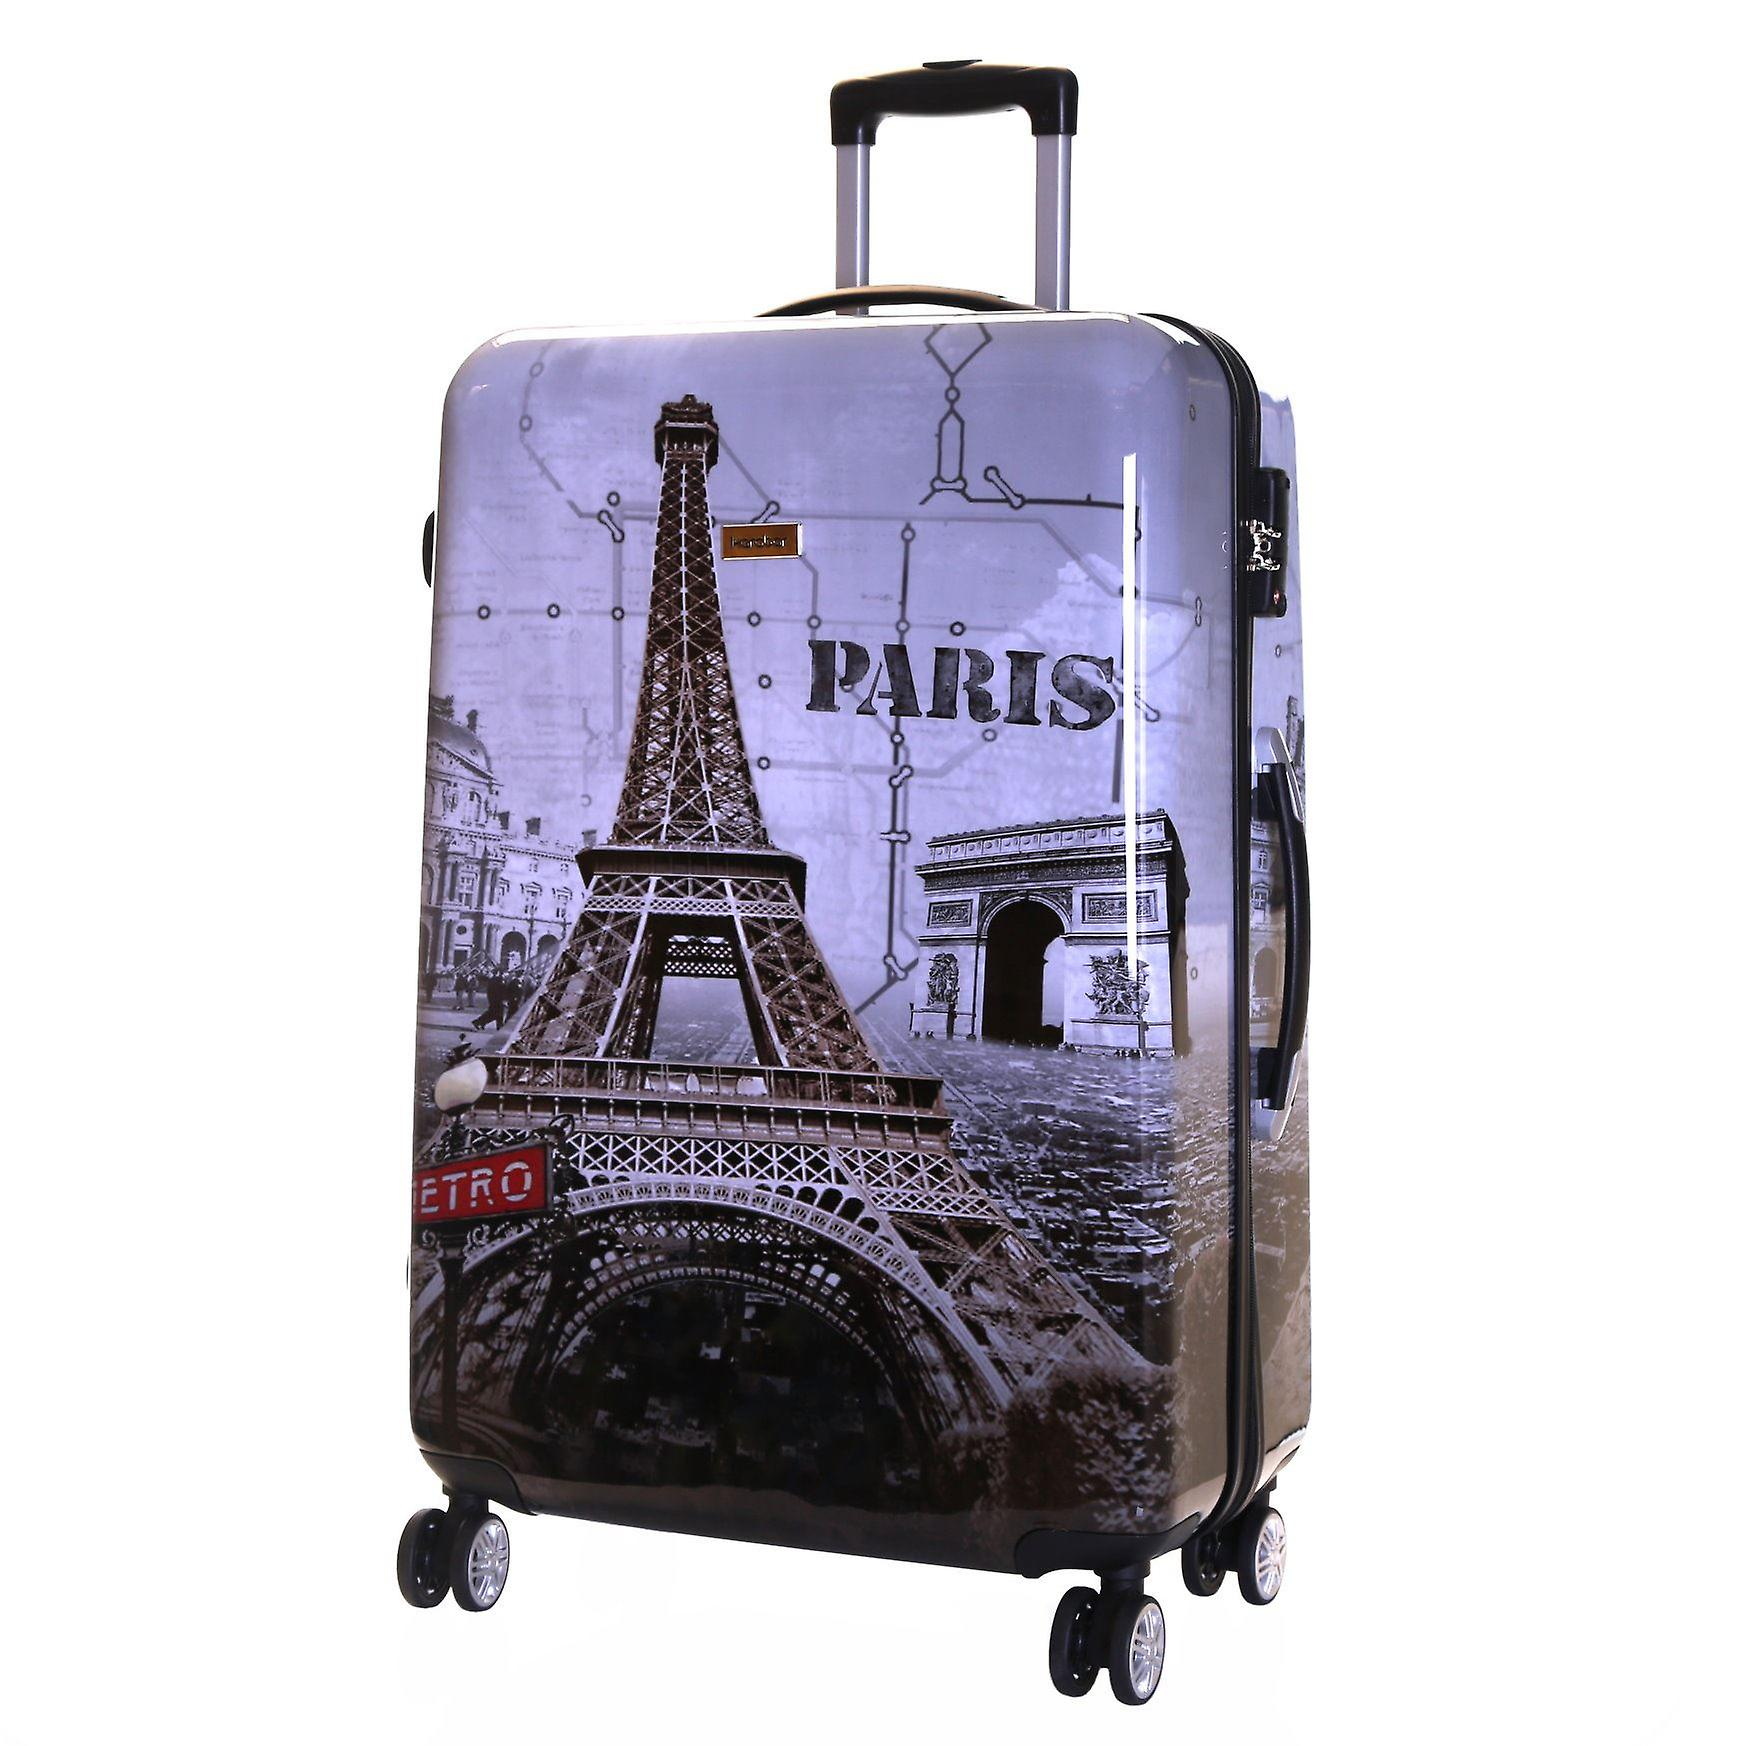 Karabar Falla Large 76 cm Hard Suitcase, Paris